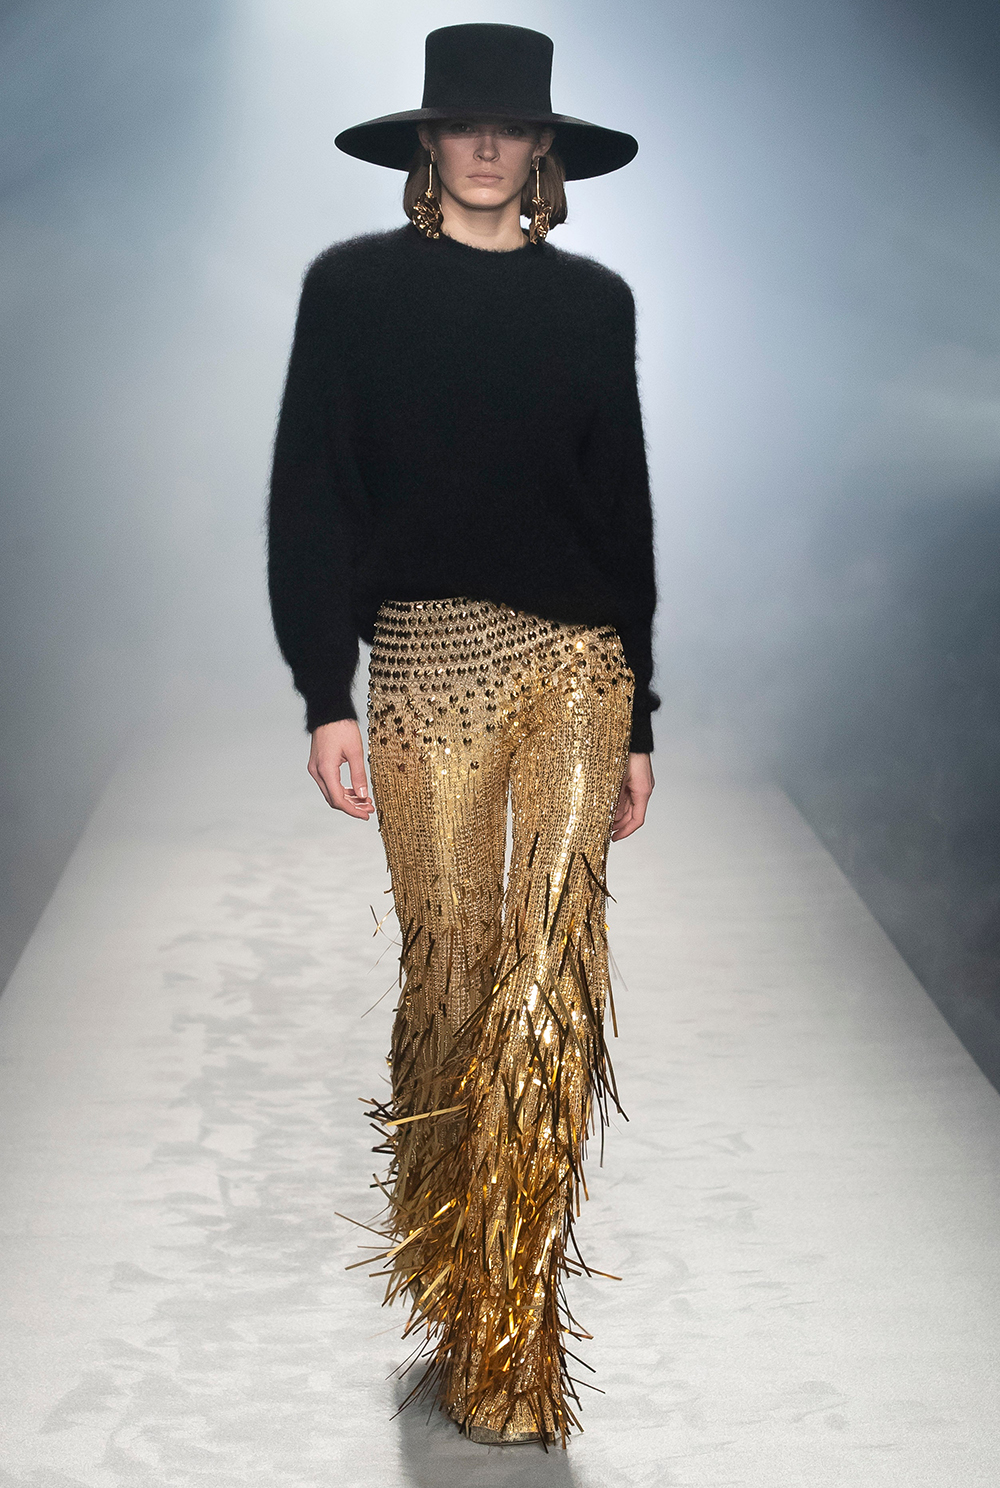 Best MFW Looks I Alberta Ferretti Fall 2021 Collection Runway #AlbertaFerretti #MilanFashionWeek #fashionblog #fashionstyle #outfitinspo